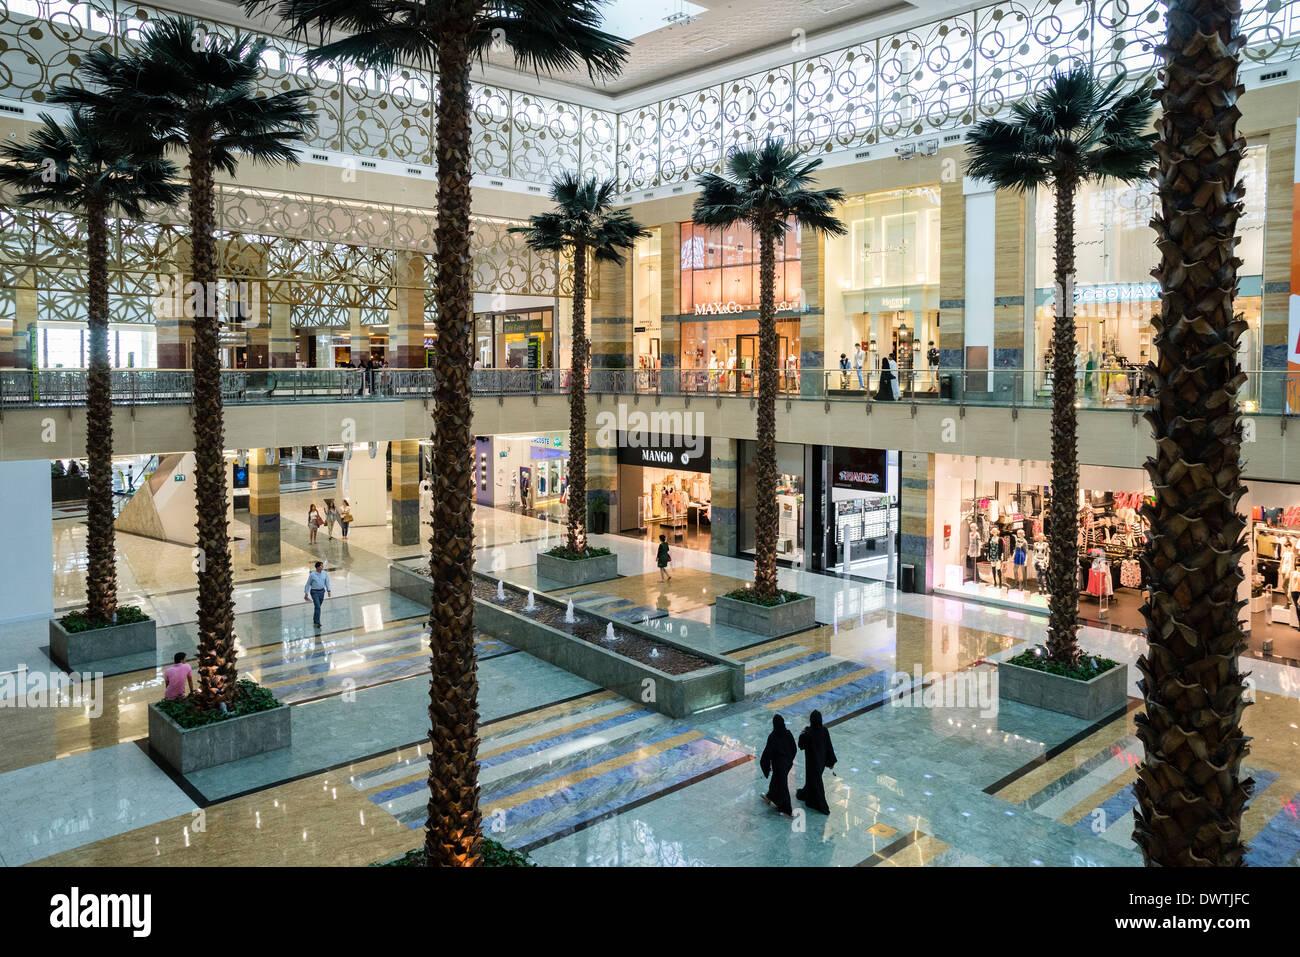 Mirdif City Centre shopping mall in Dubai United Arab Emirates Stock Photo